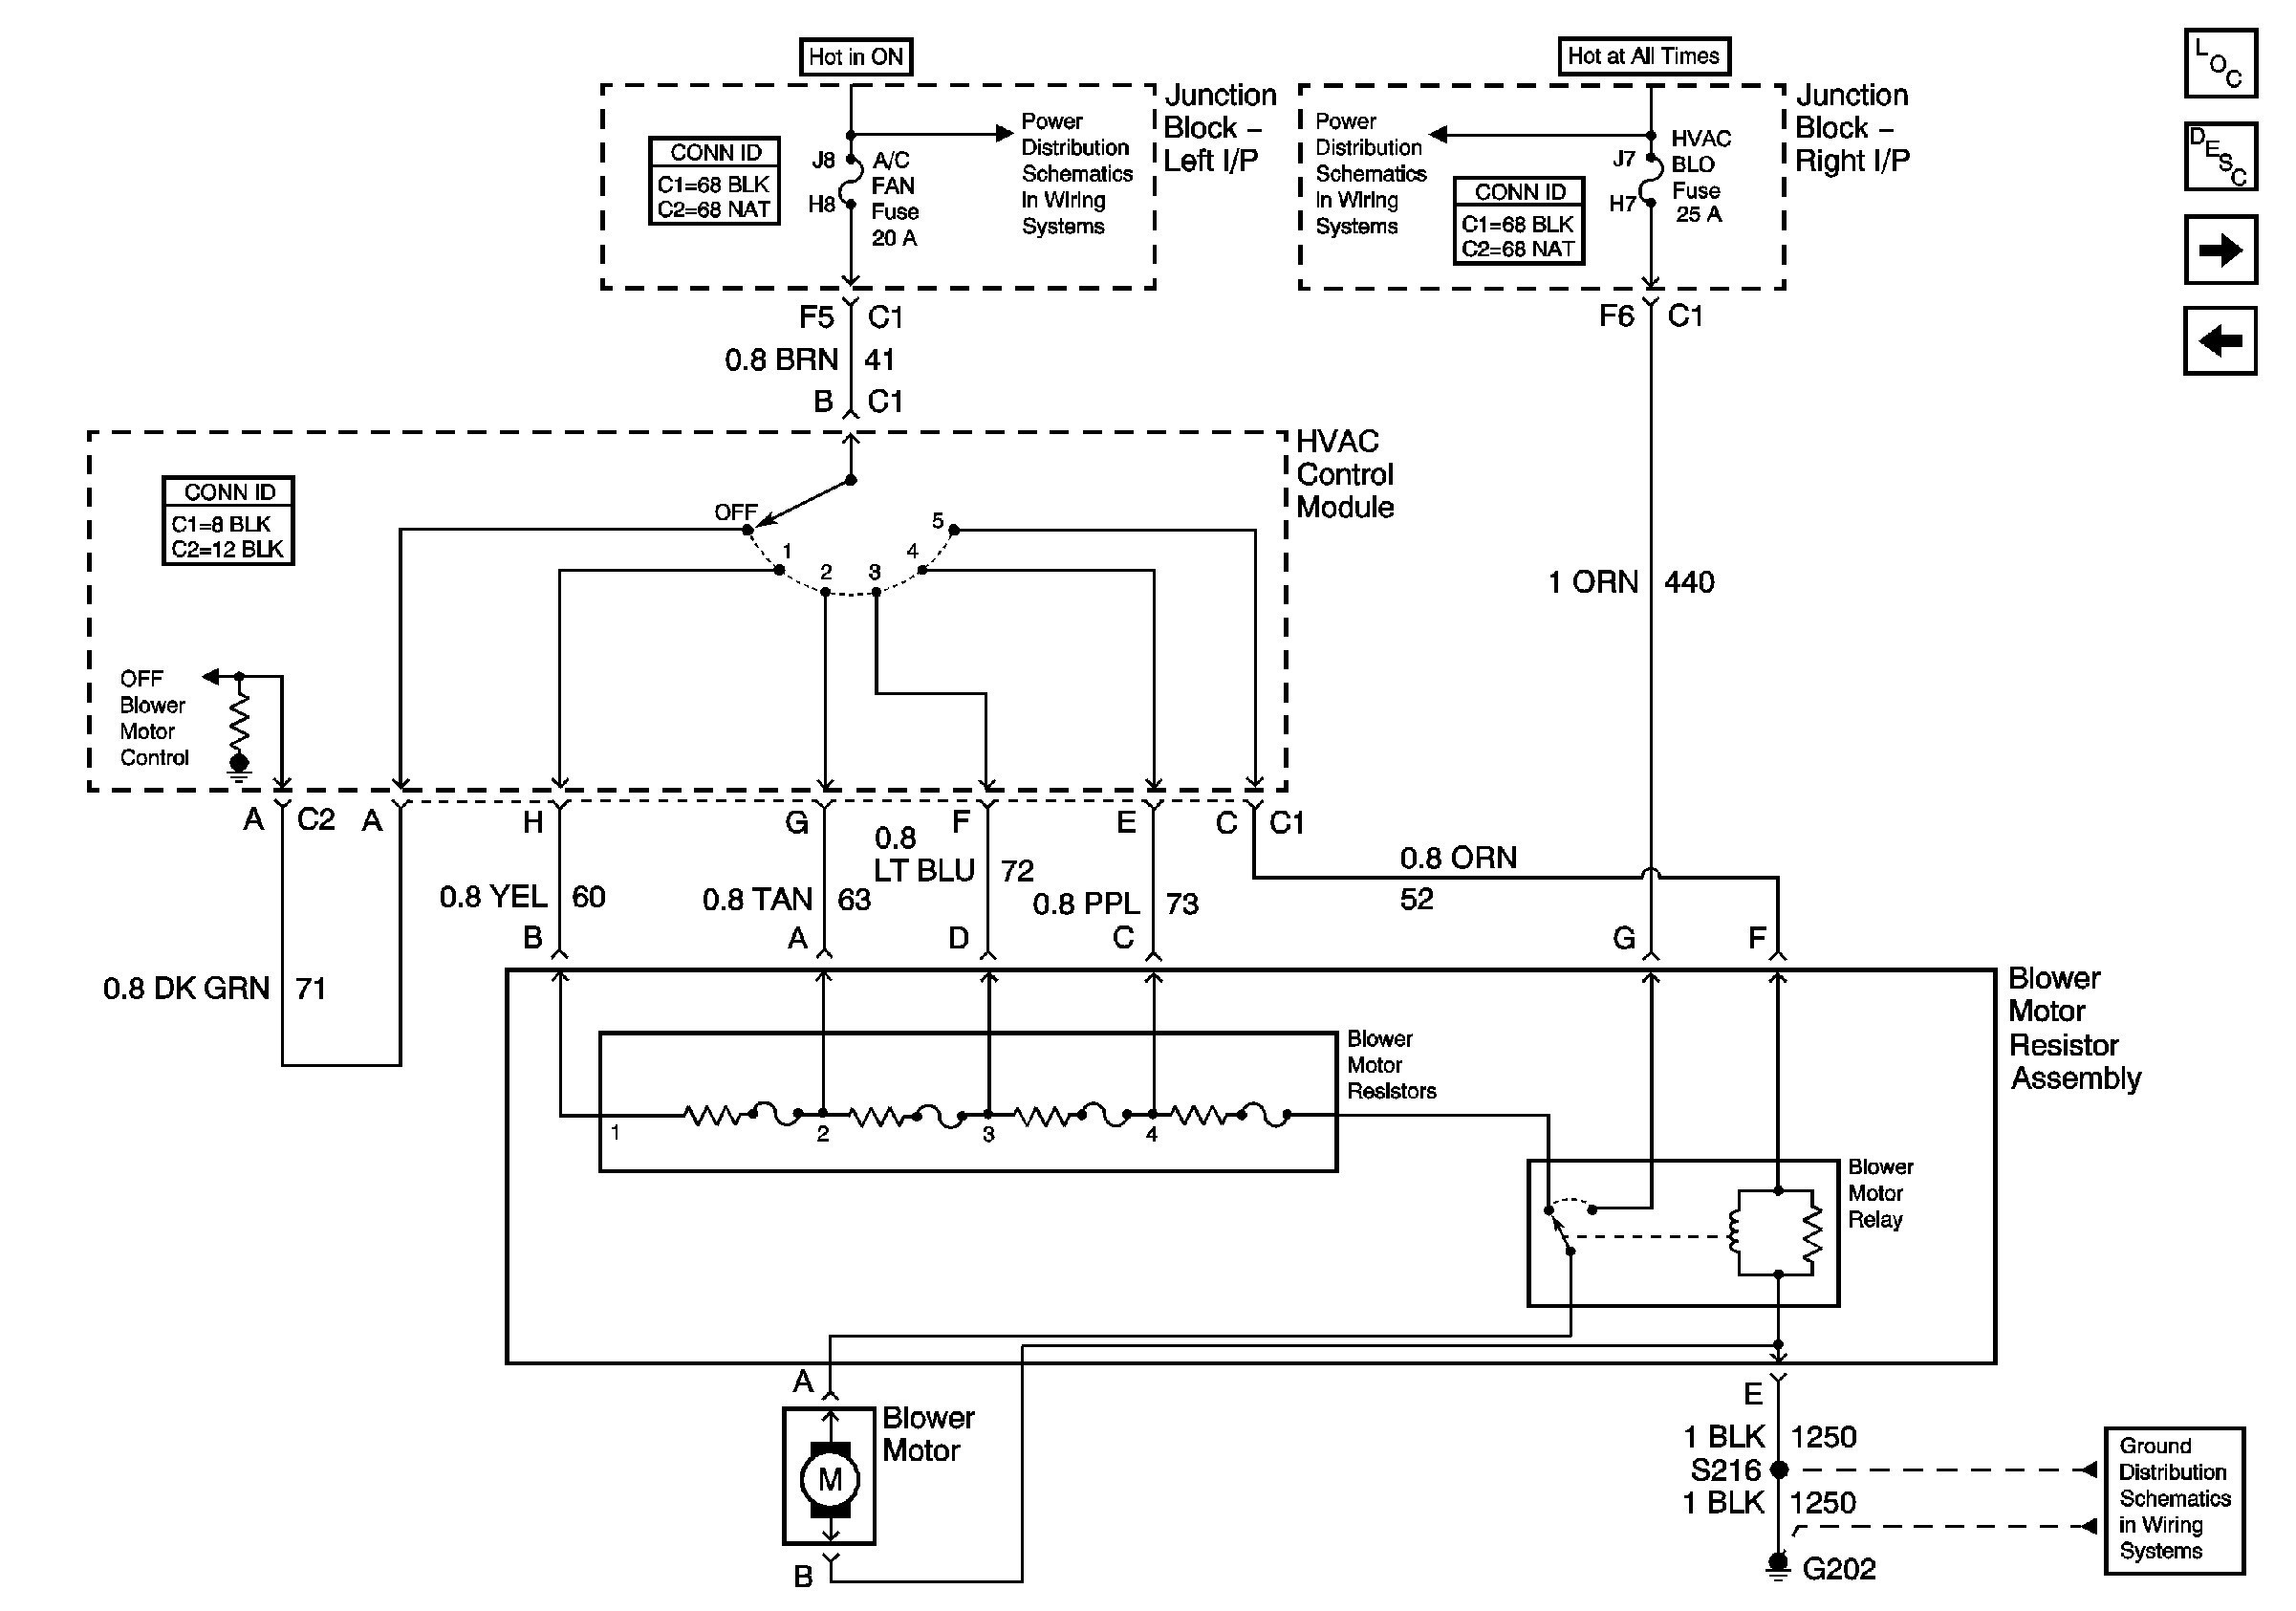 07 Sportage Blower Motor Wiring Diagram Library Kia Electrical Rio Engine Suburban Data Of